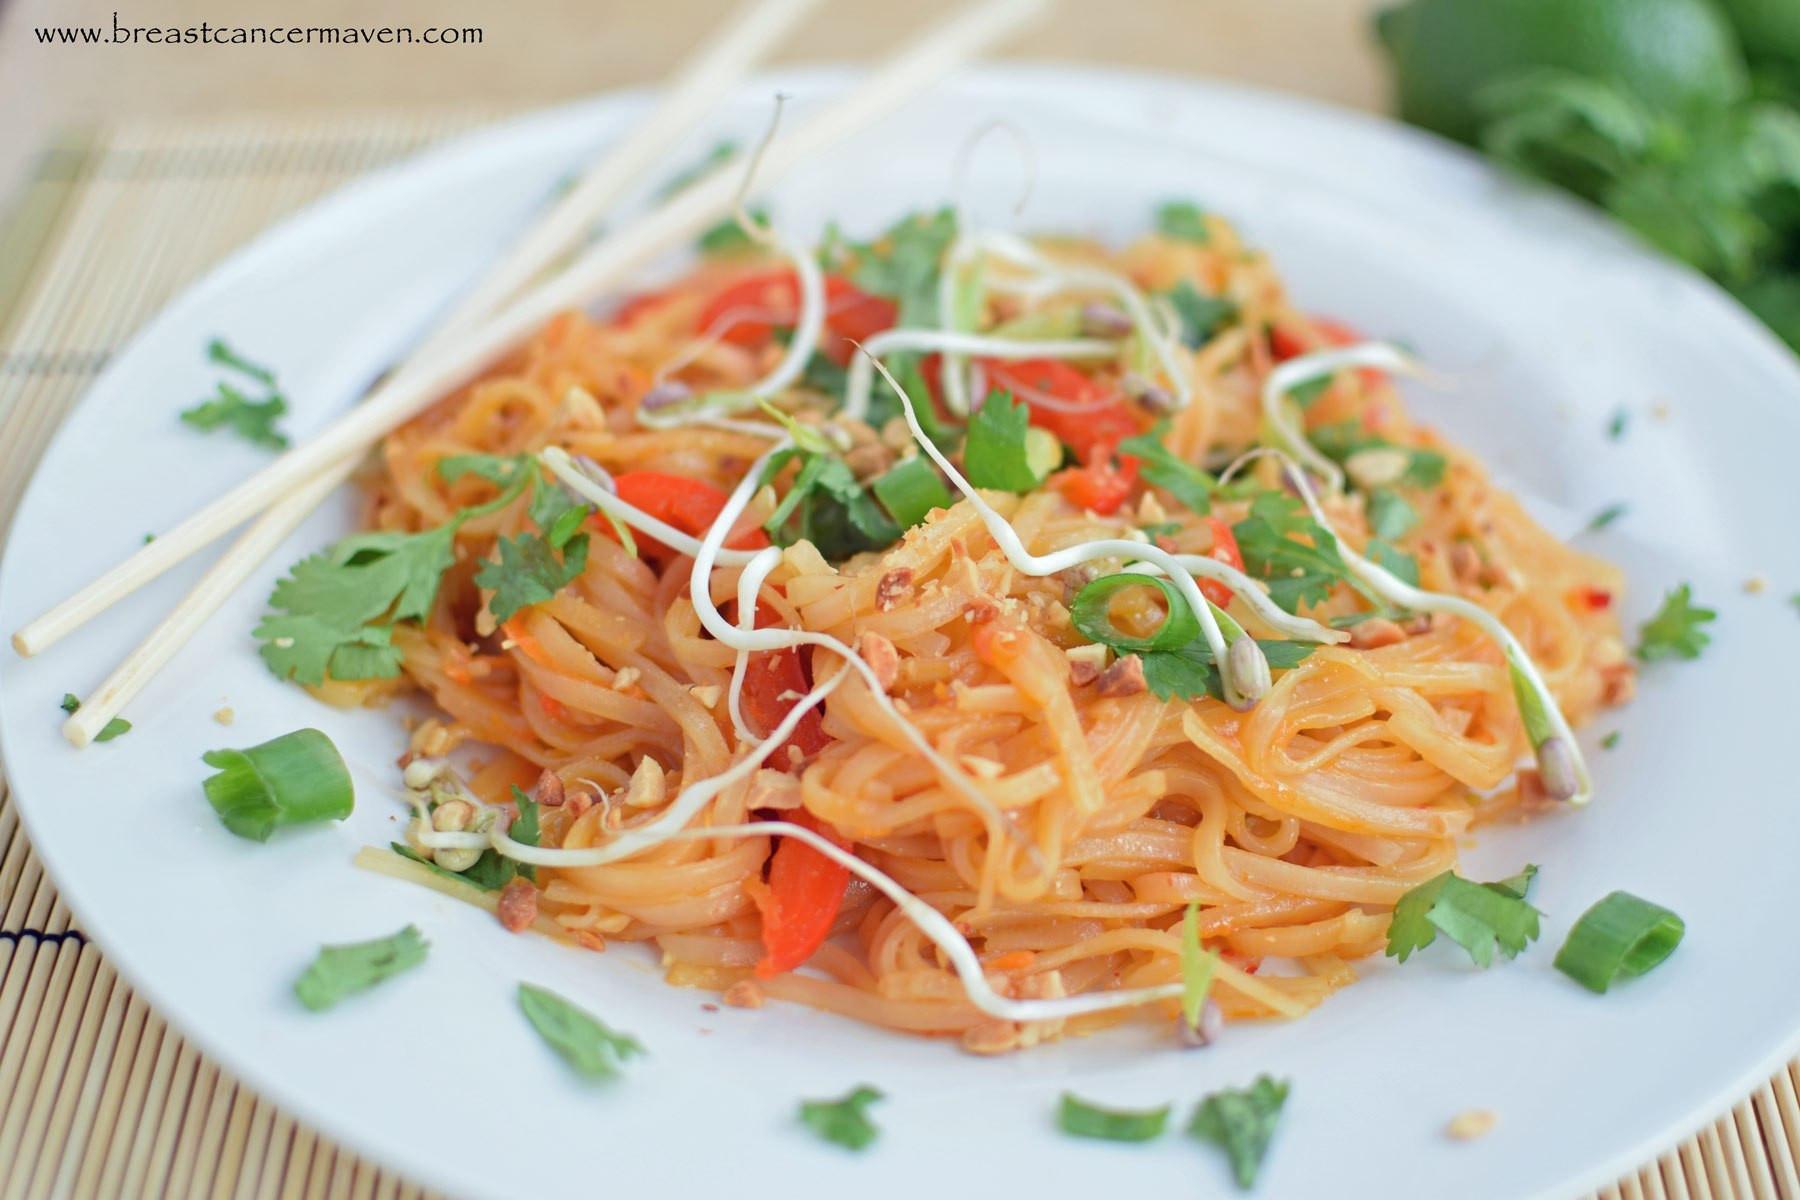 Healthy Pad Thai Sauce  Healthy Pad Thai Vegan and Gluten Free Breast Cancer Maven